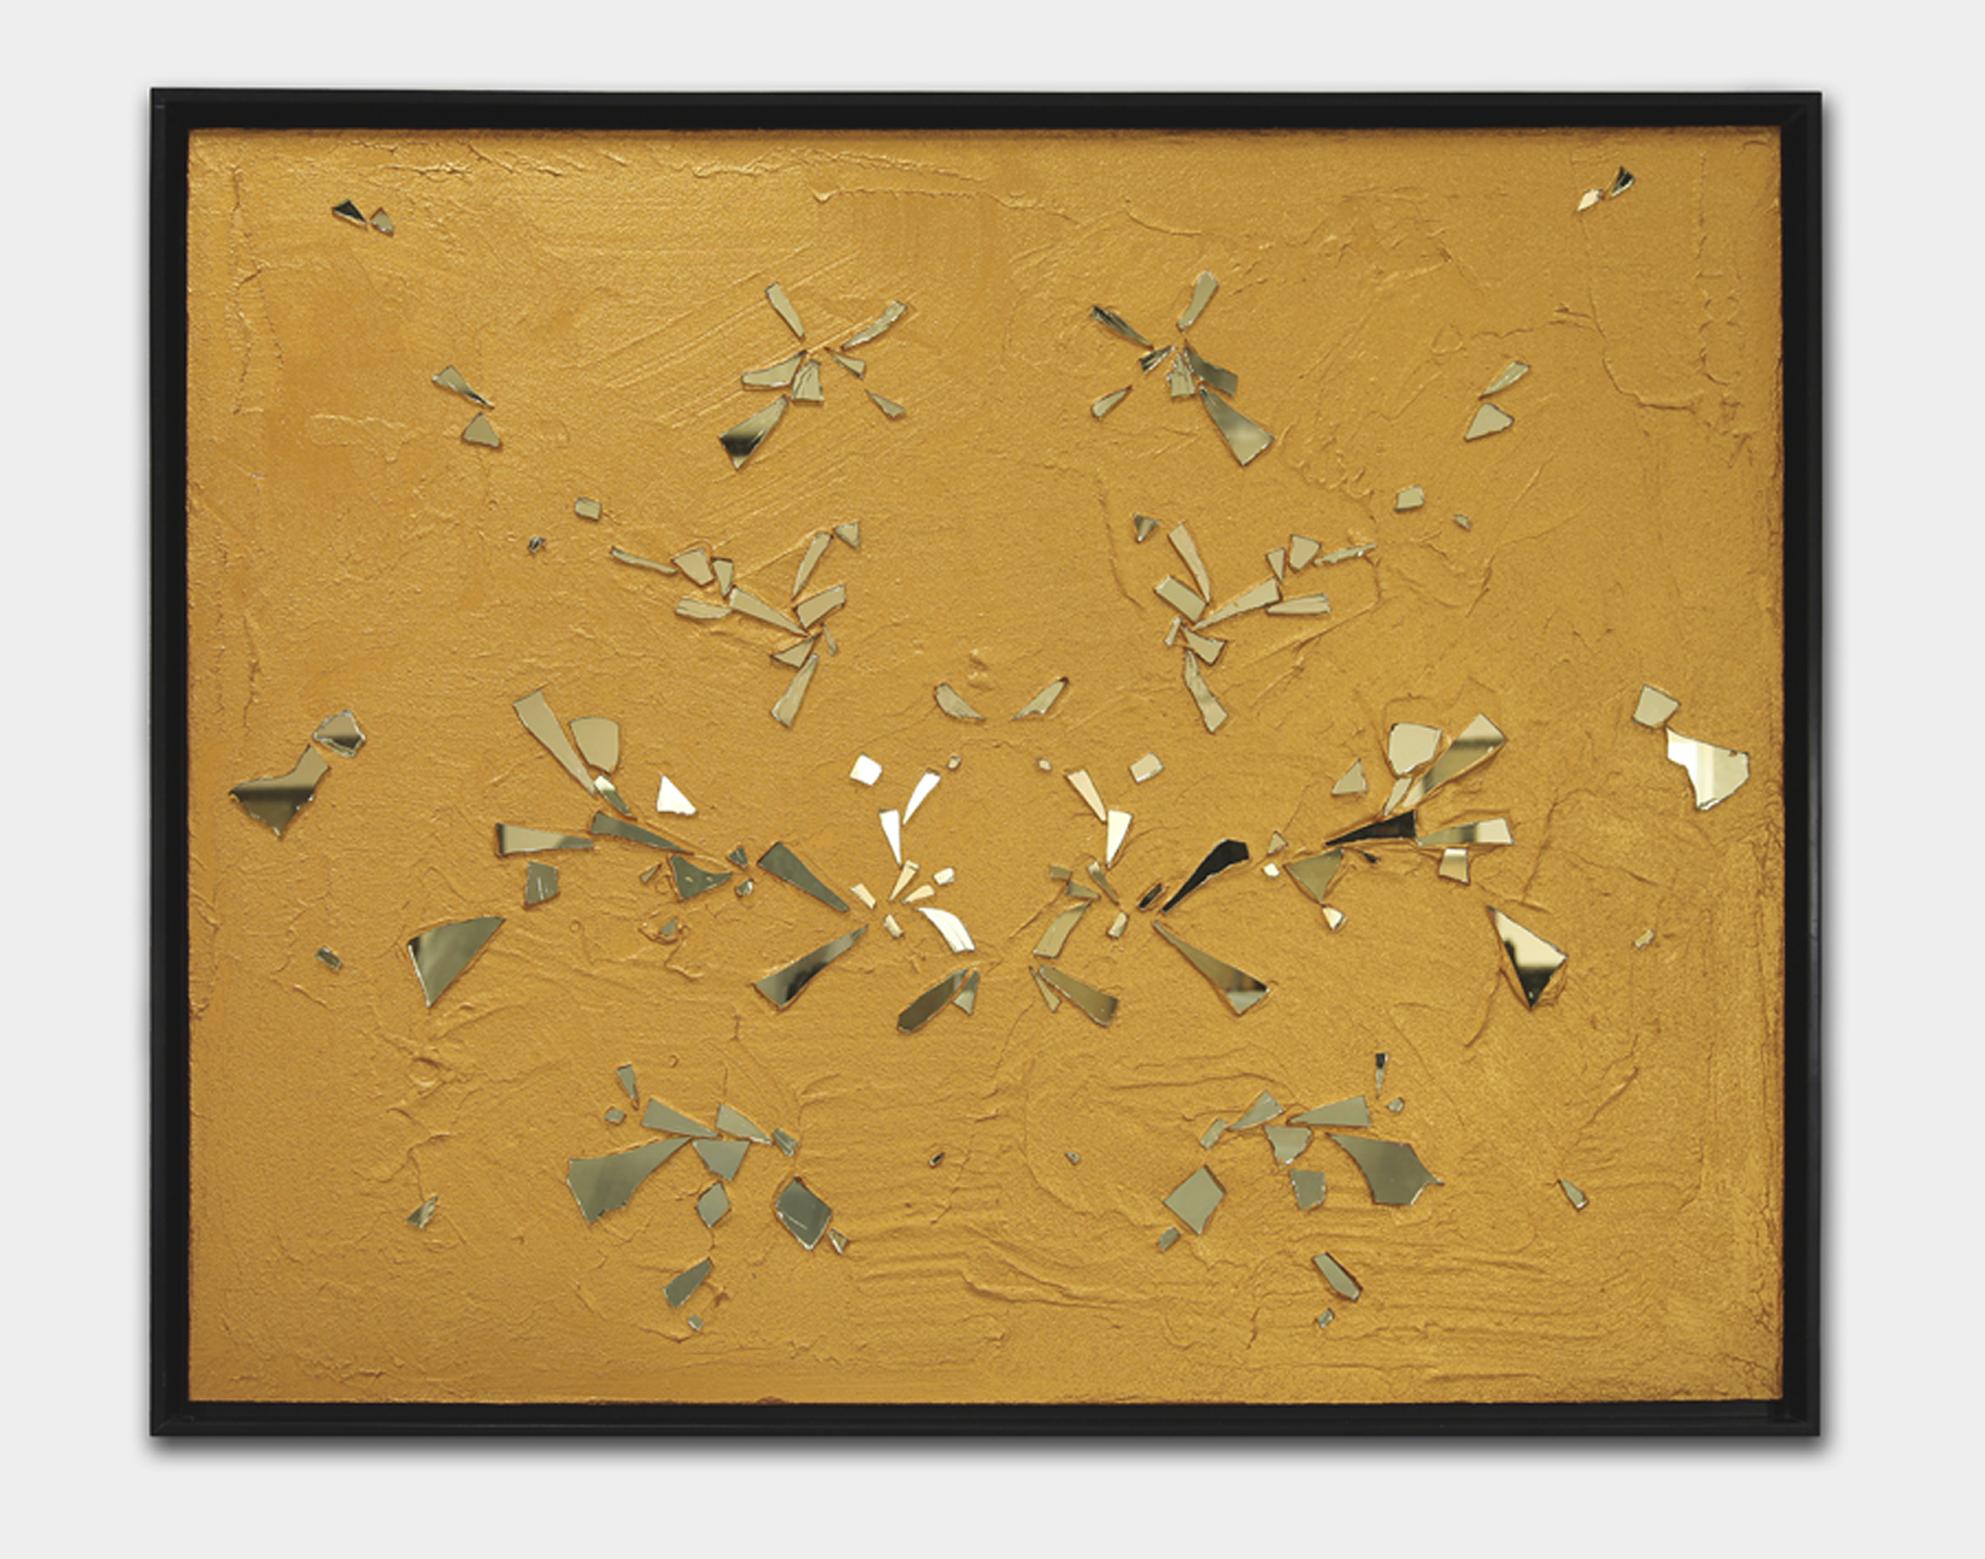 Gao Weigang 高伟刚, Vice 恶习, 2013, Acrylic on canvas and mirror 布面丙烯、镜子, 120 x 150 cm